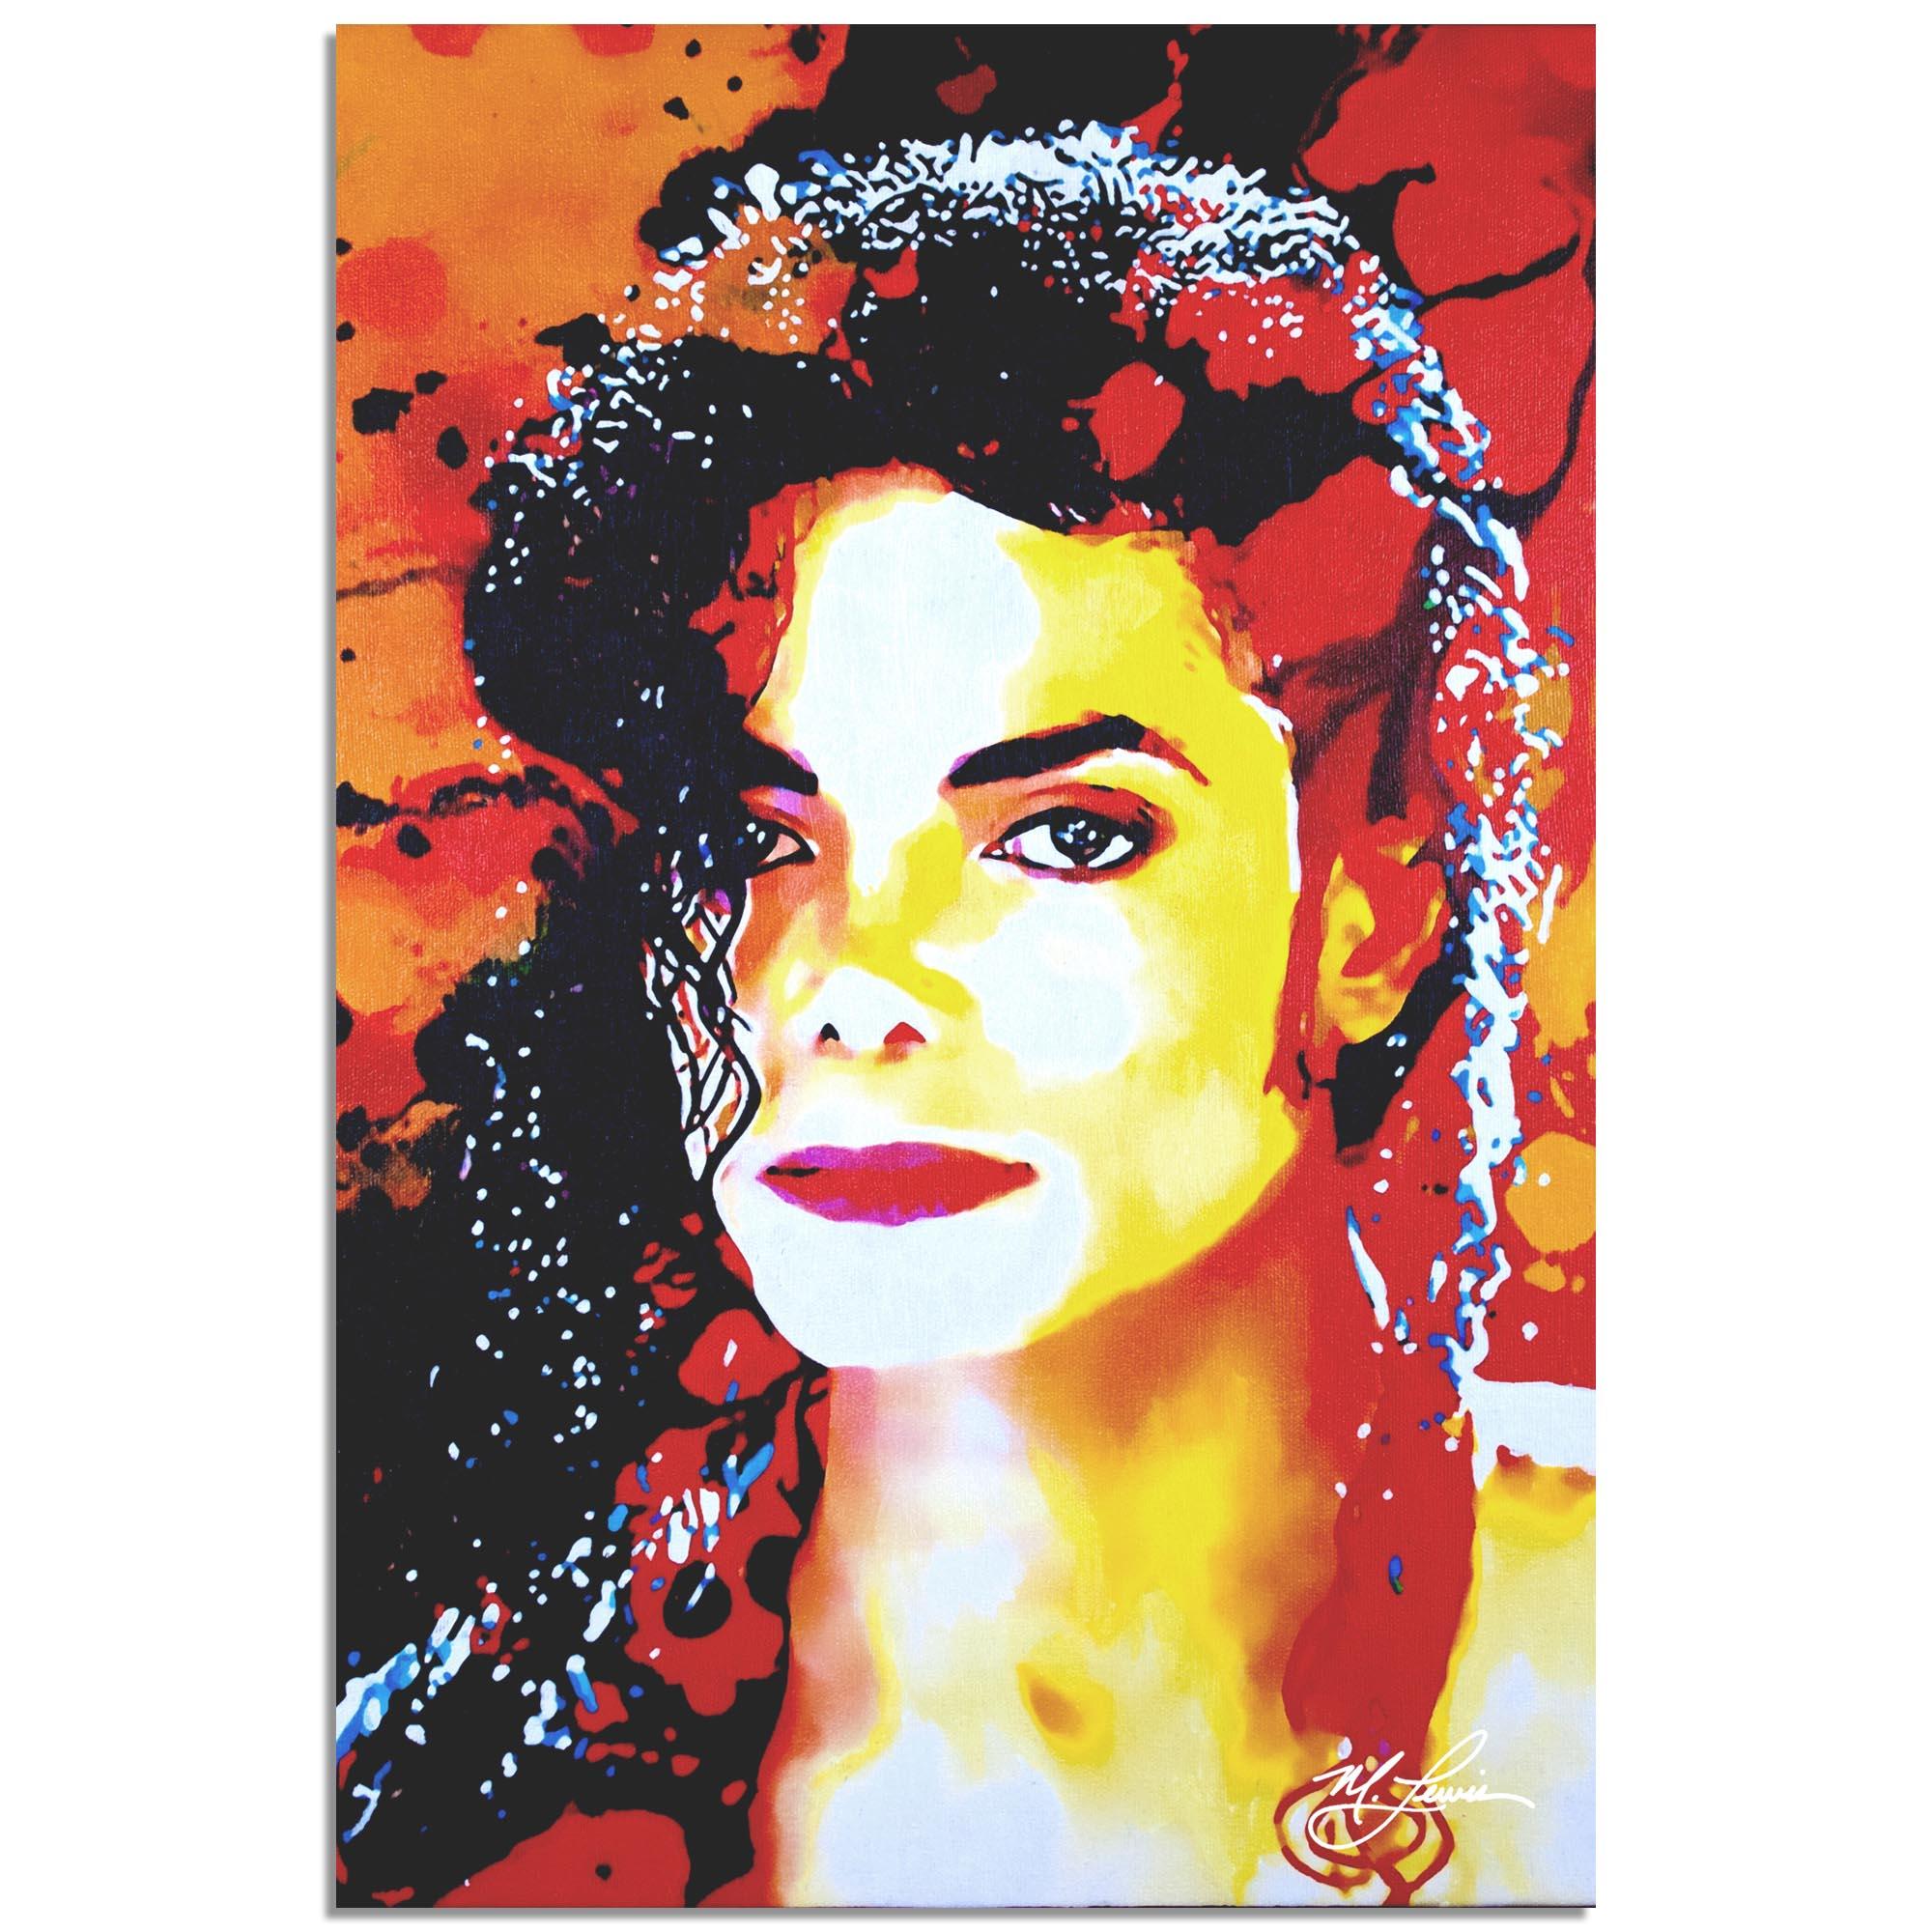 Mark Lewis 'Michael Jackson Perfection Veteran' 22in x 32in Celebrity Pop Art on Metal or Plexiglass